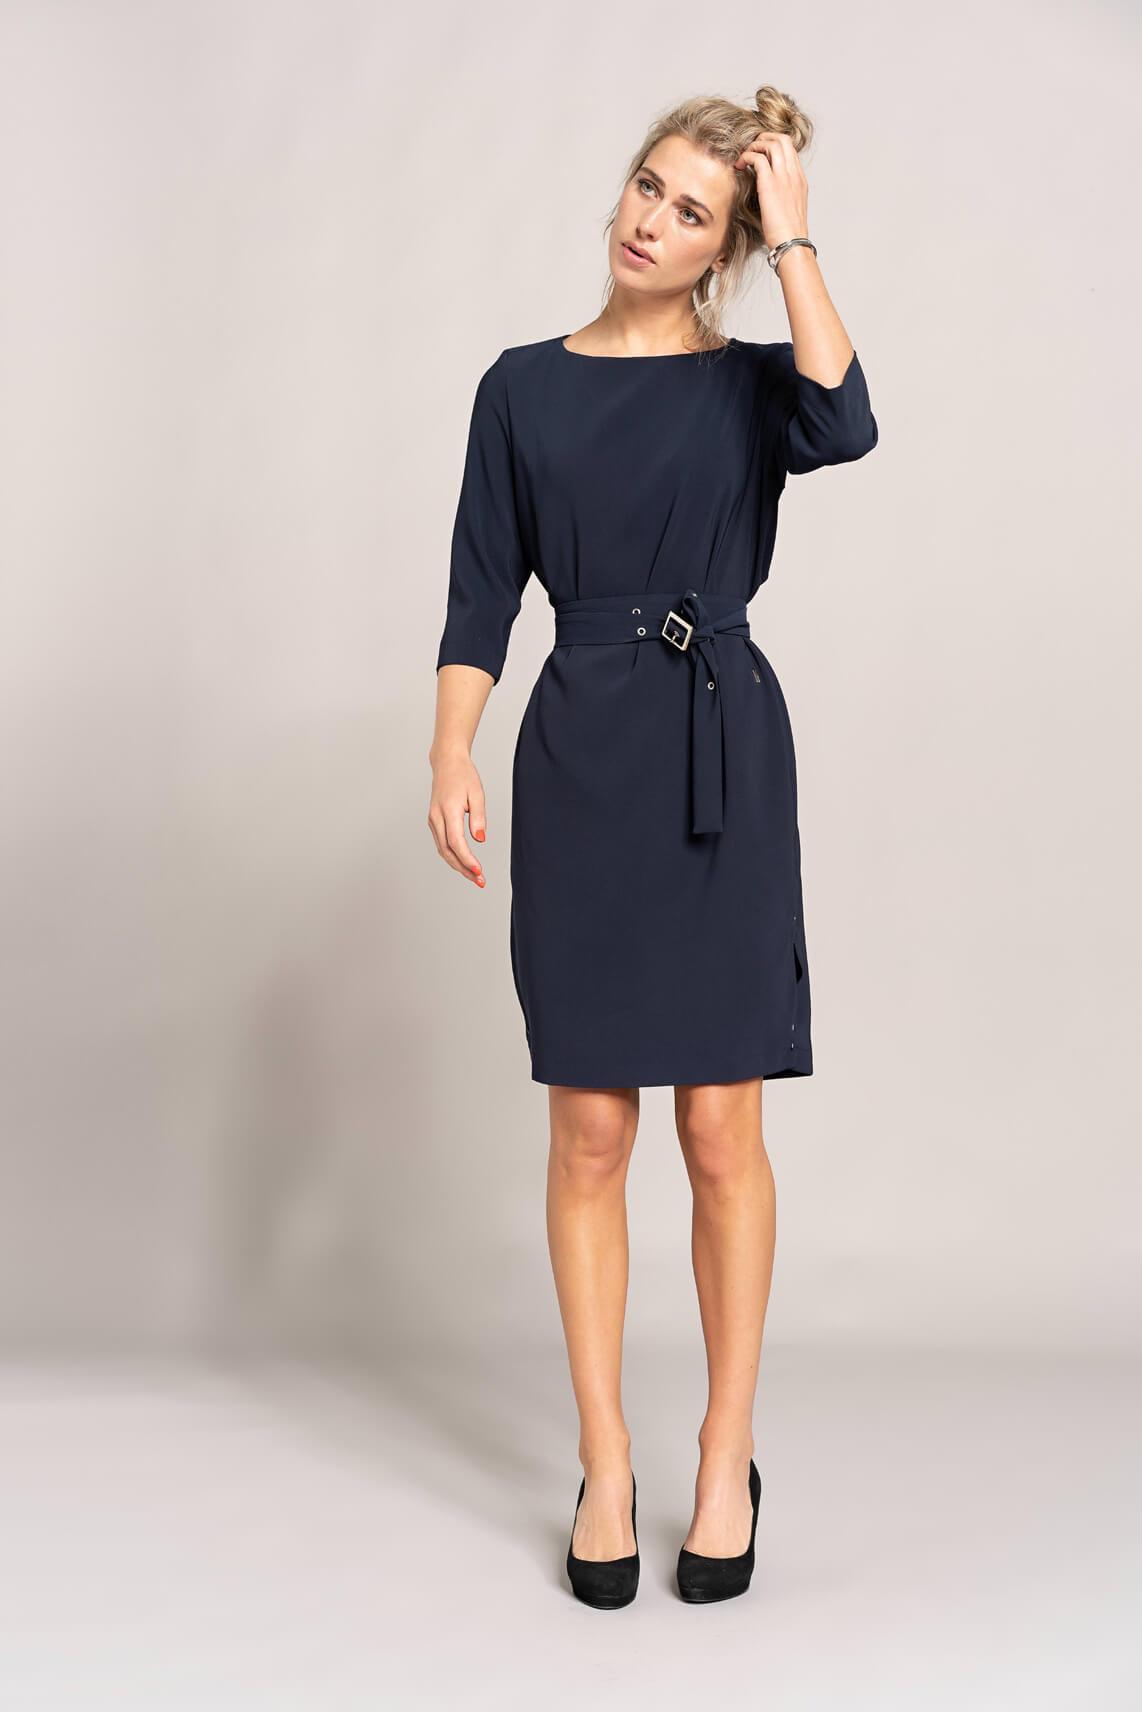 Dames The blue dress